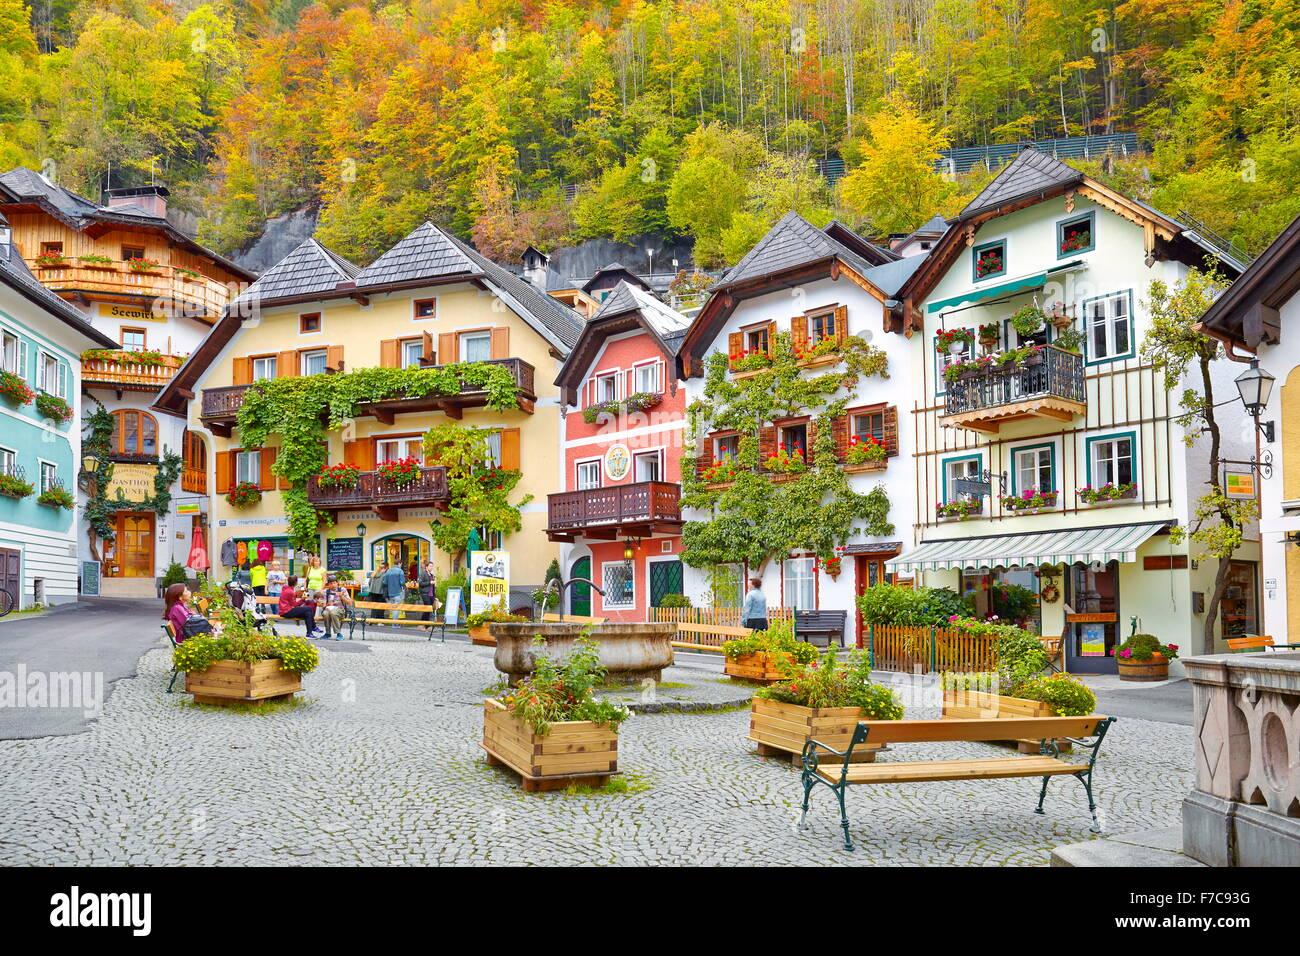 Bunte Häuser, Dorf Hallstatt, Salzkammergut, Österreich Stockbild